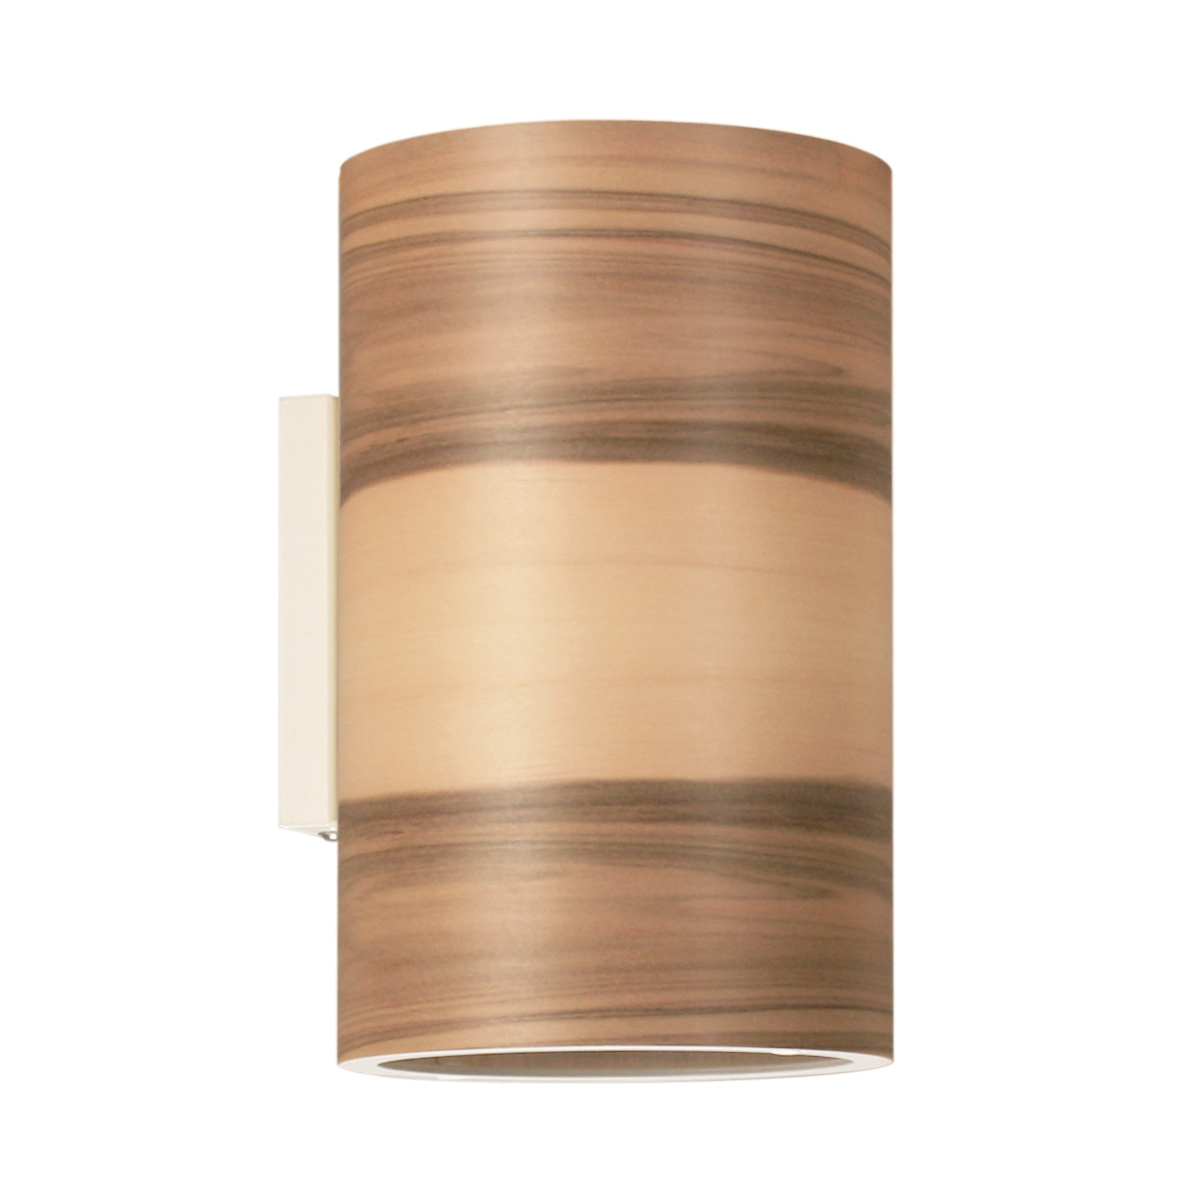 elegante up and down wandleuchte mit schirm aus echtholzfurnier. Black Bedroom Furniture Sets. Home Design Ideas